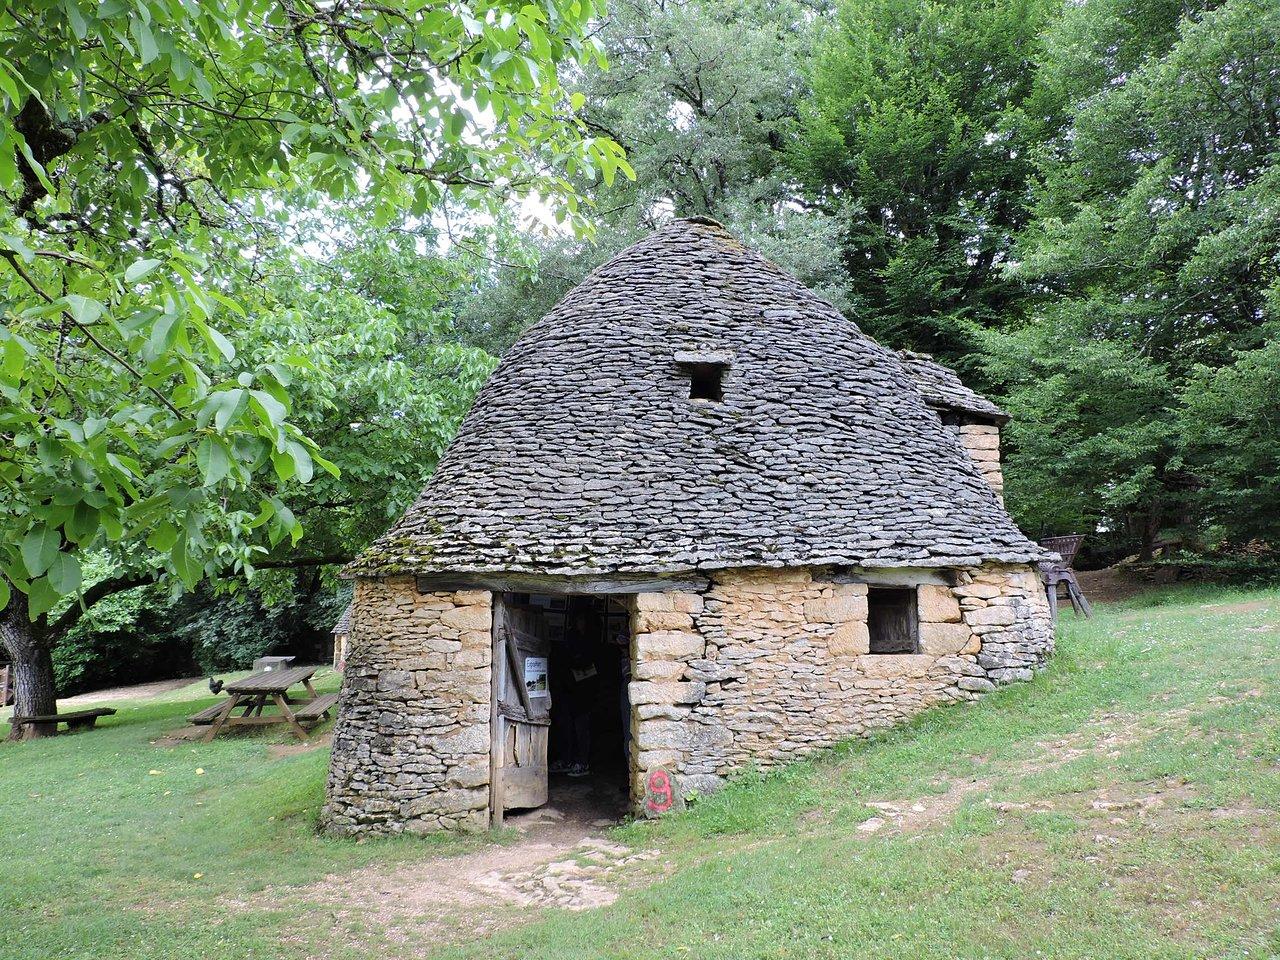 555-cabanes-du-breuil-saint-andre-d'allas.jpg